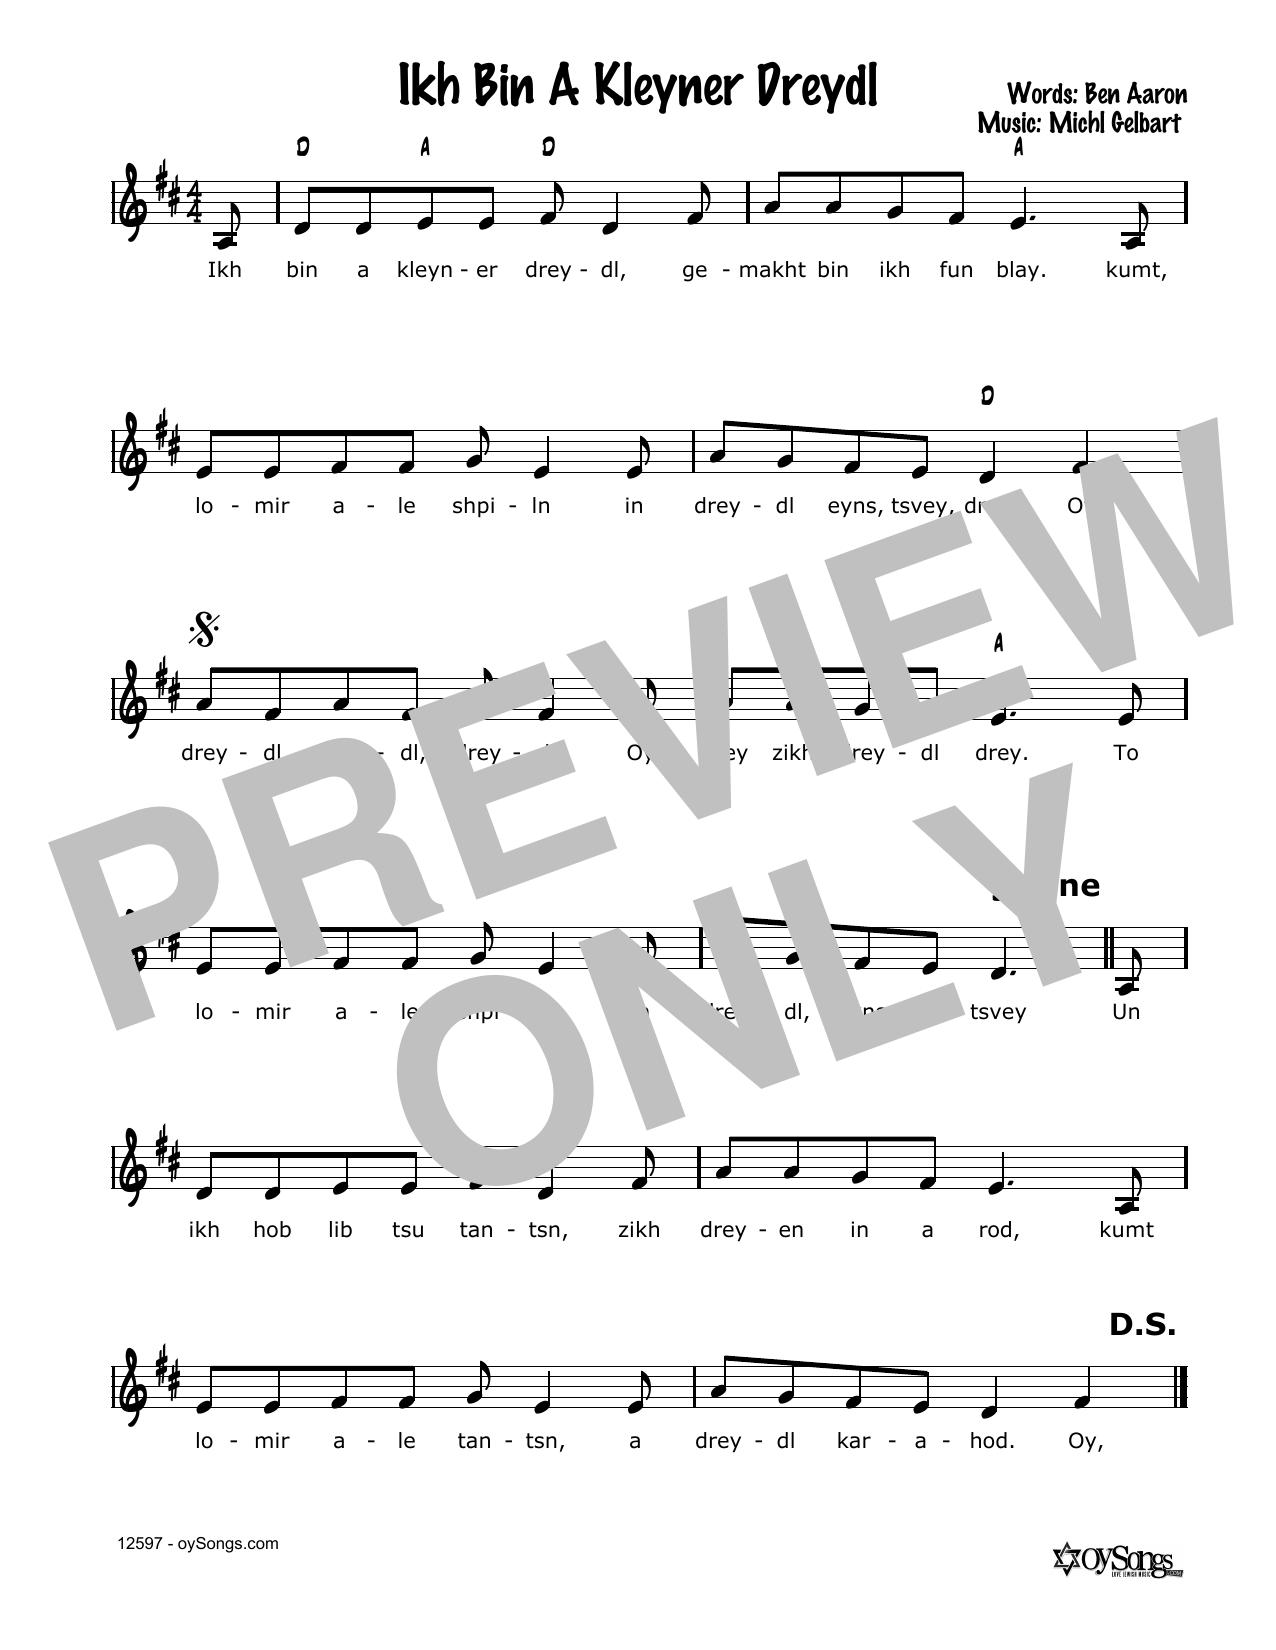 Ikh Bin A Kleyner Dreydl Sheet Music